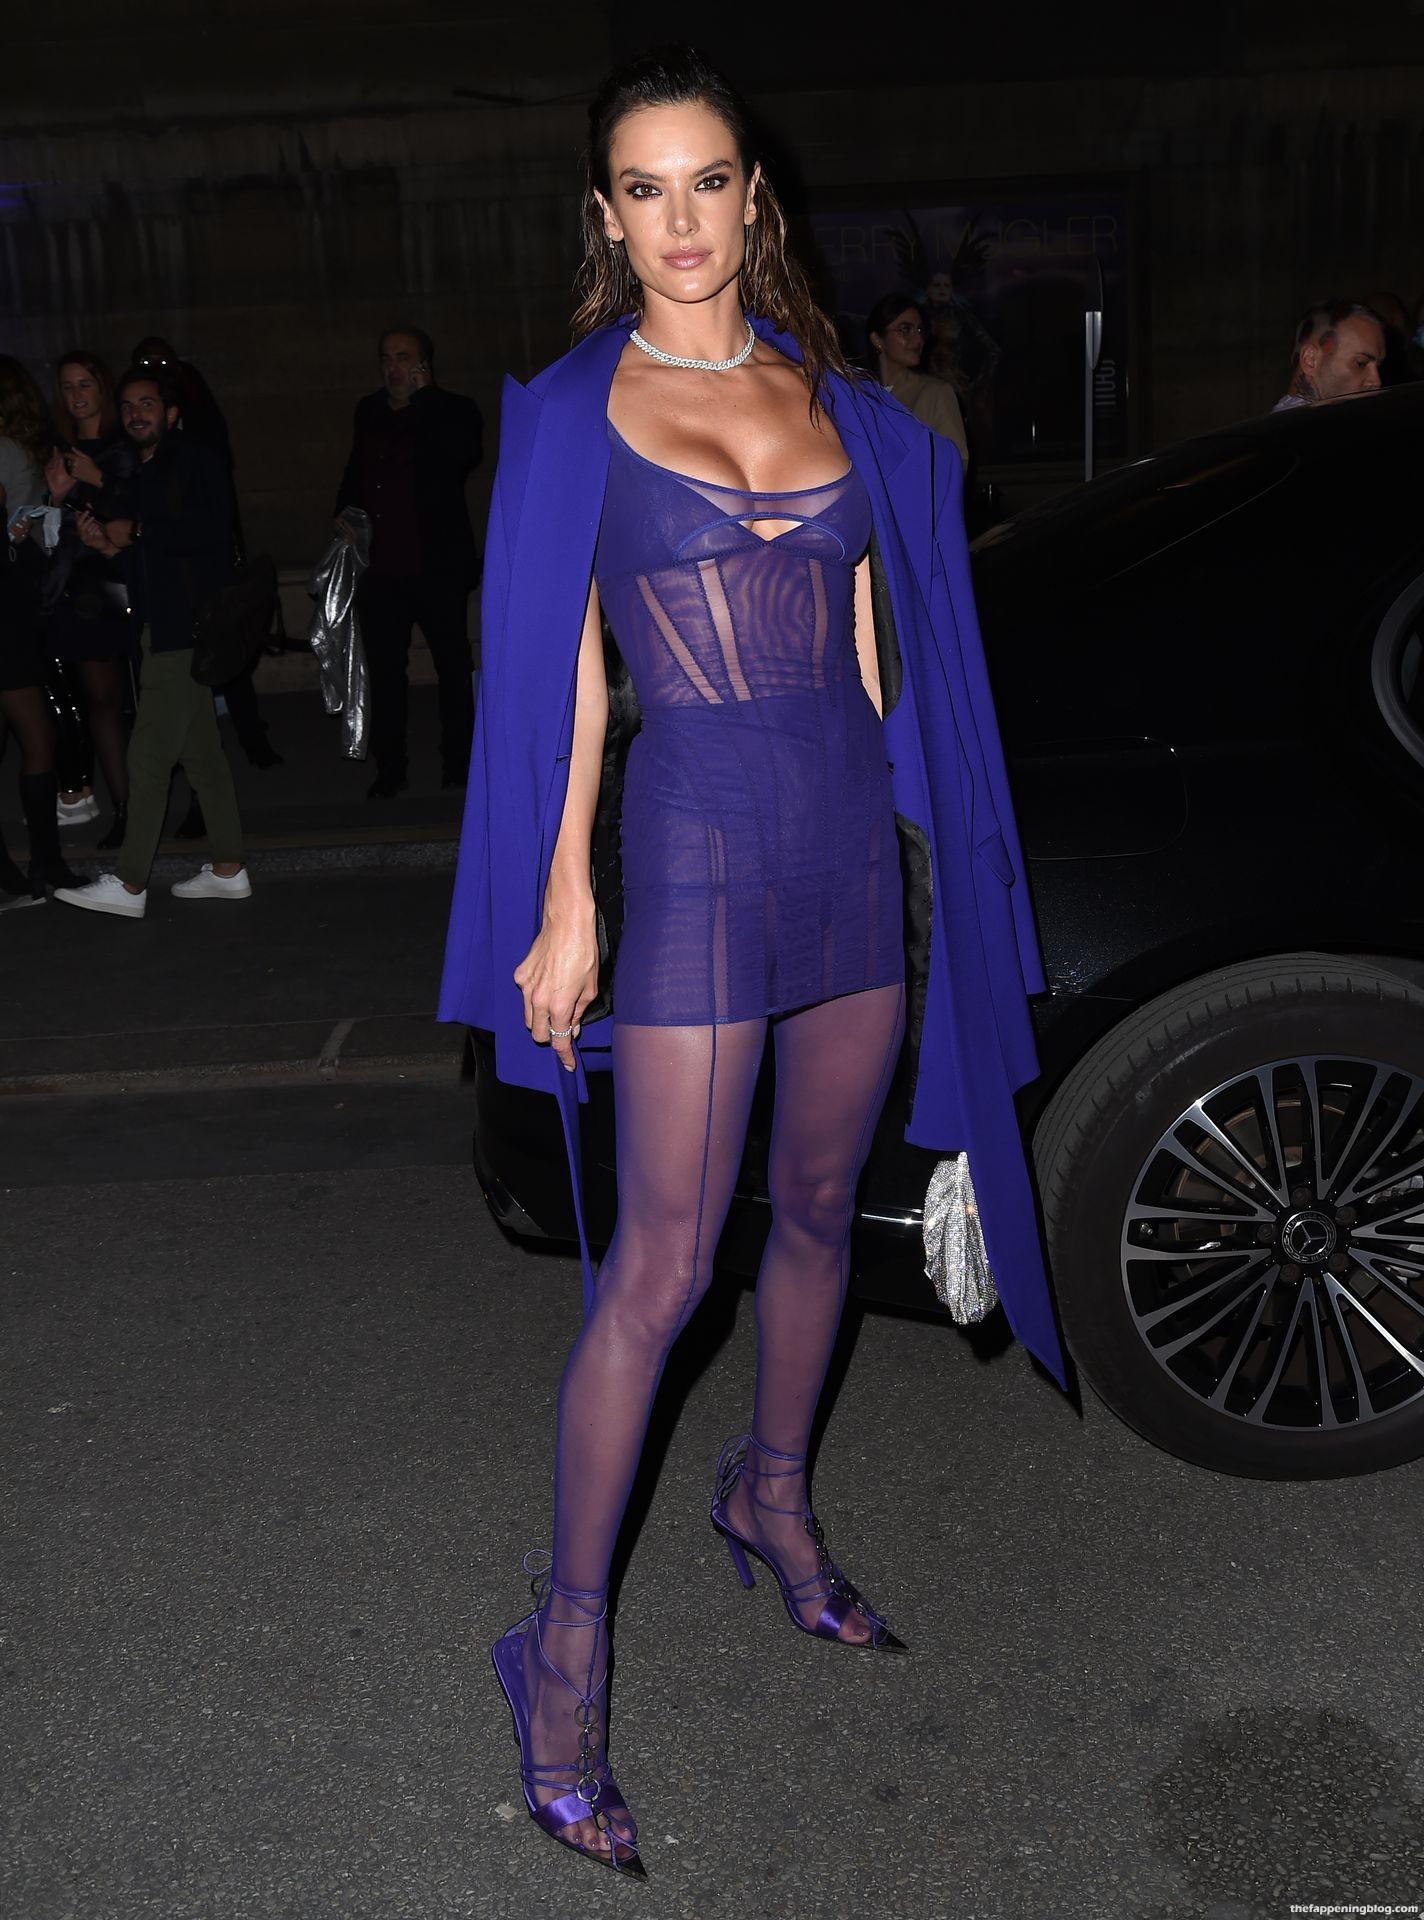 Alessandra-Ambrosio-Sexy-The-Fappening-Blog-26-3.jpg